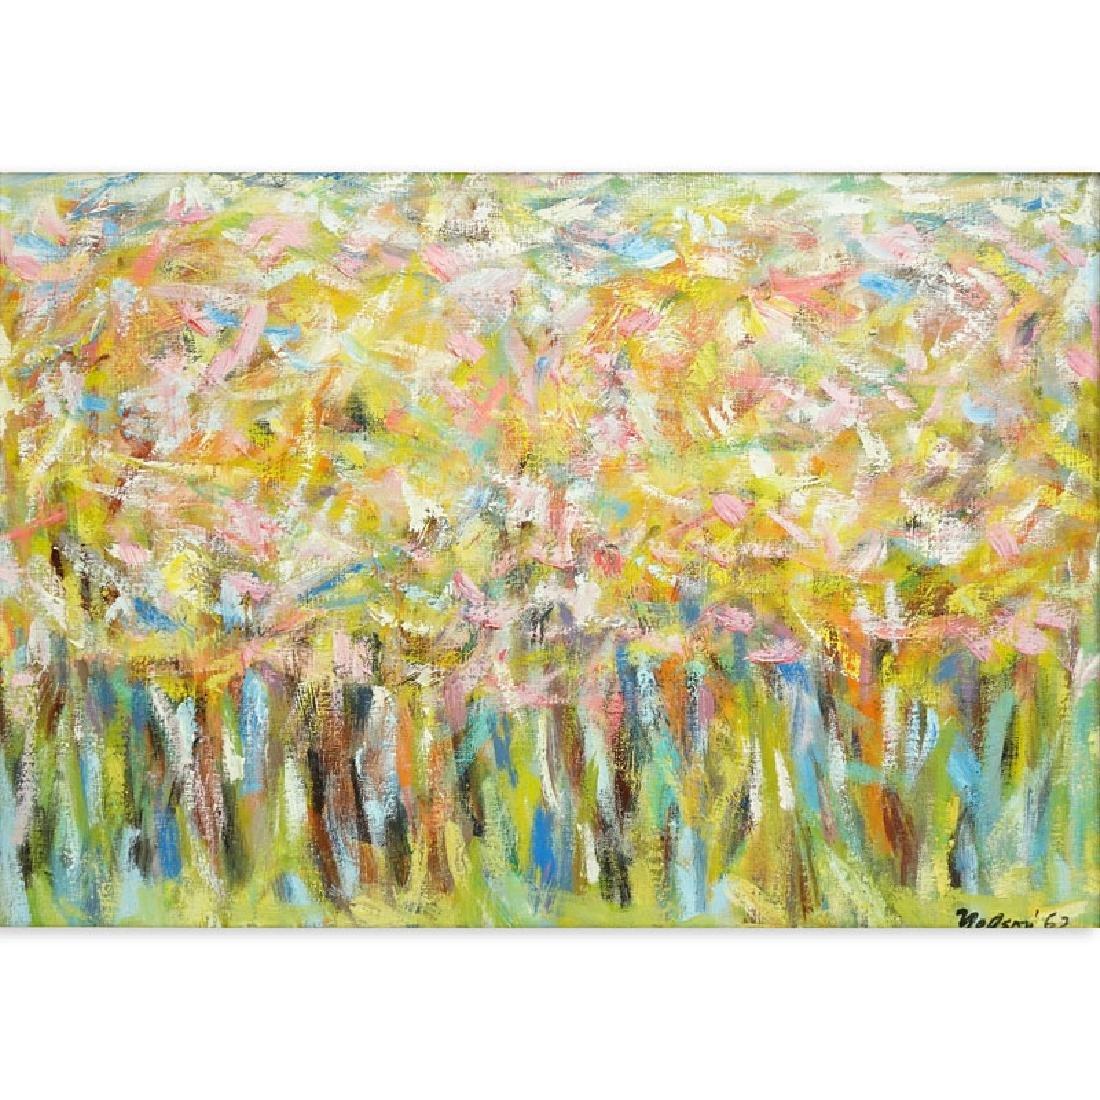 Leonard Nelson, American (1912 - 1993) Oil and acrylic